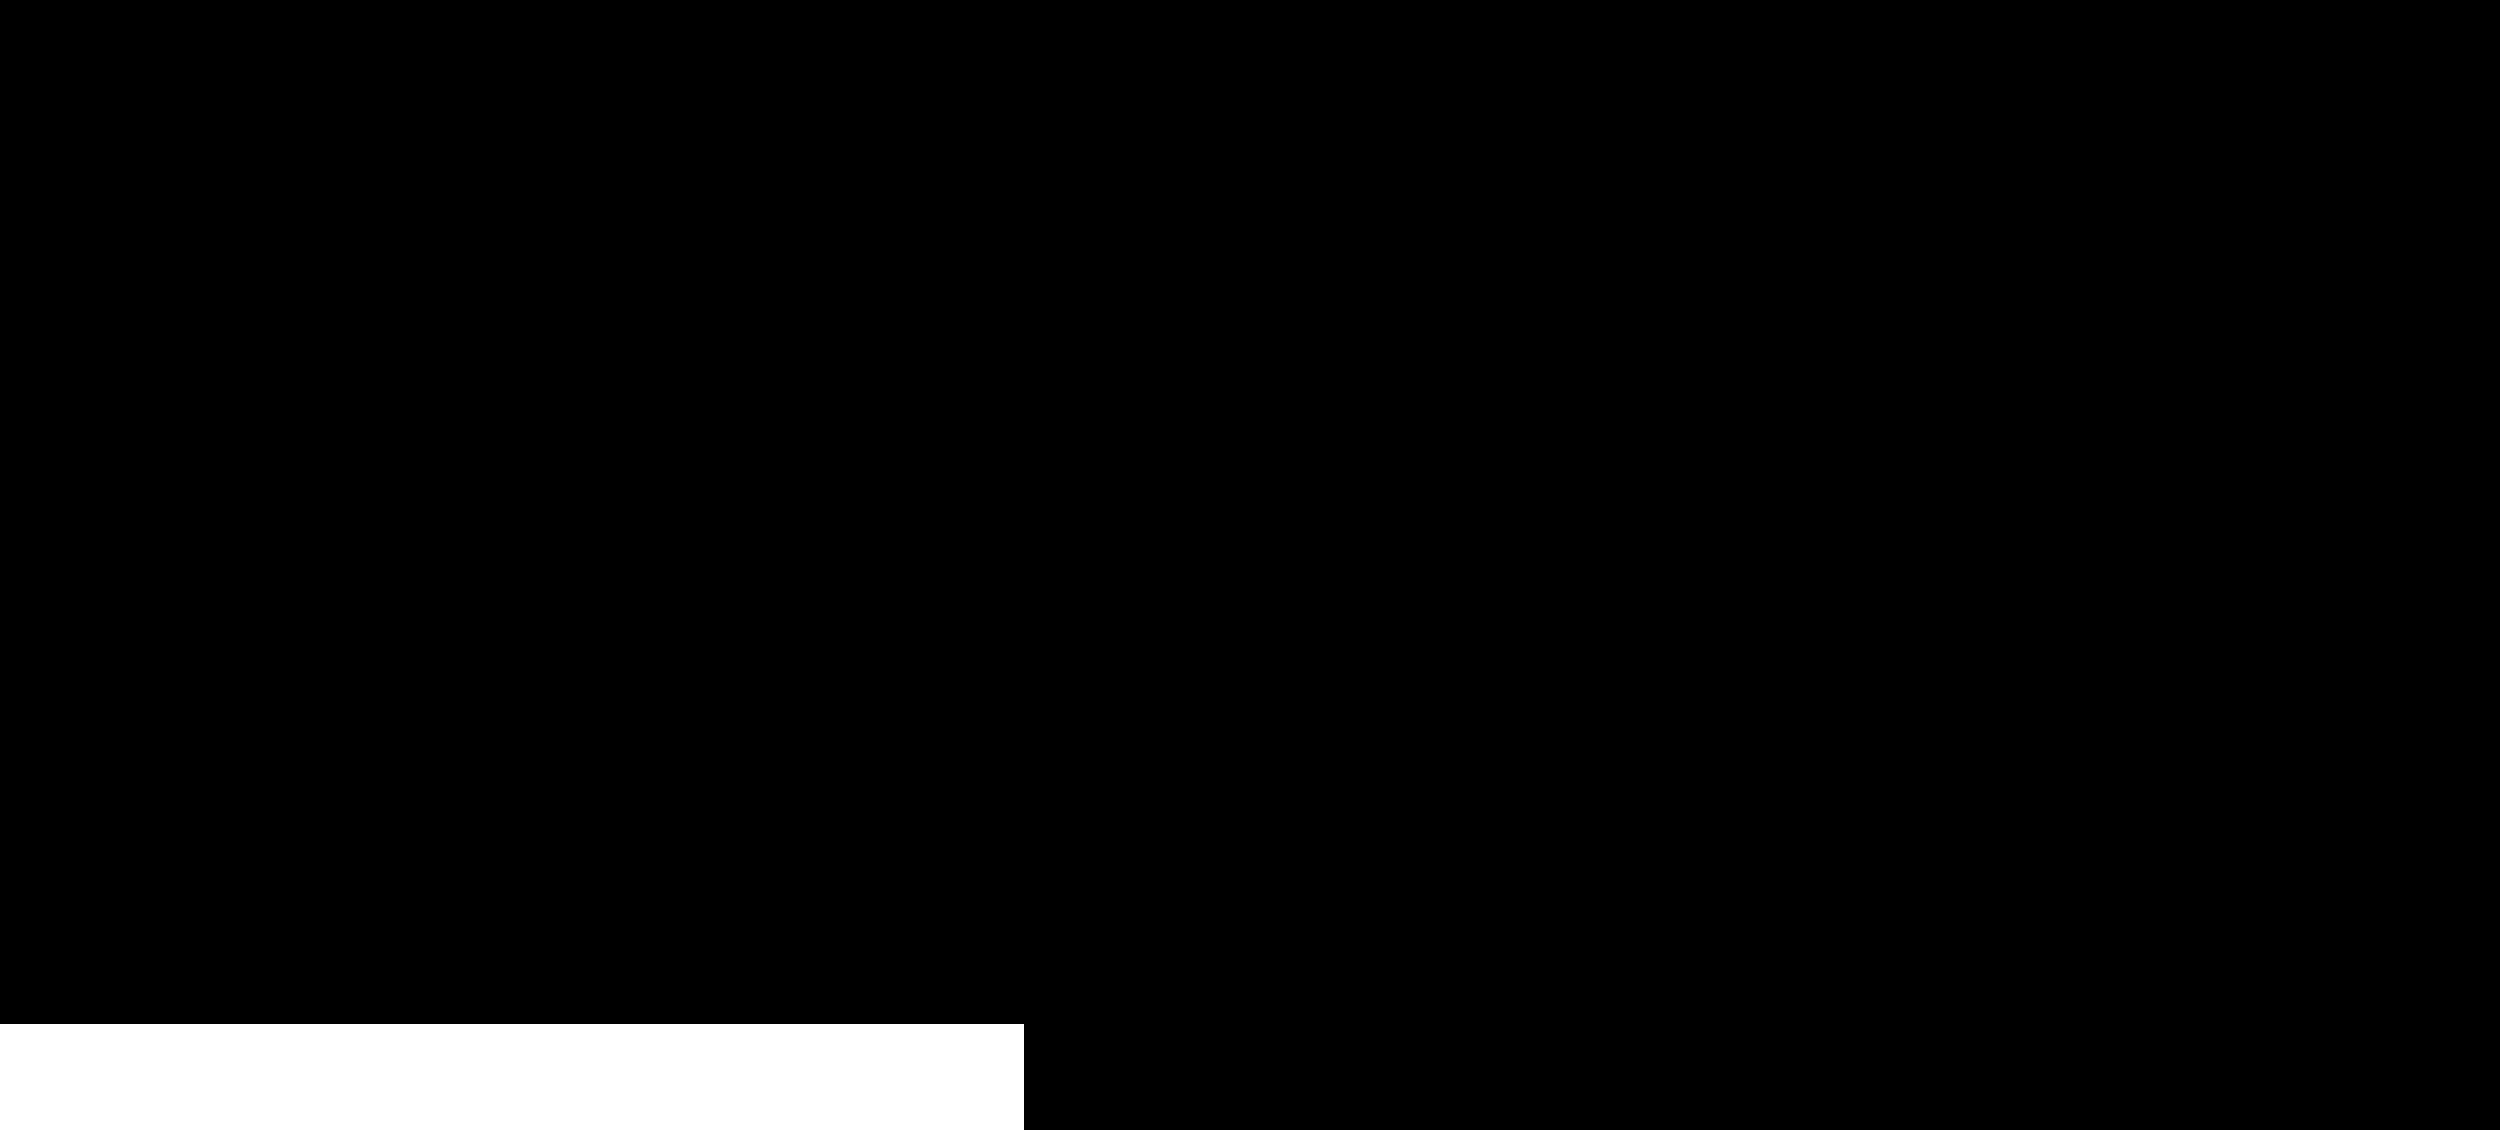 Giffy-logo-BLACK